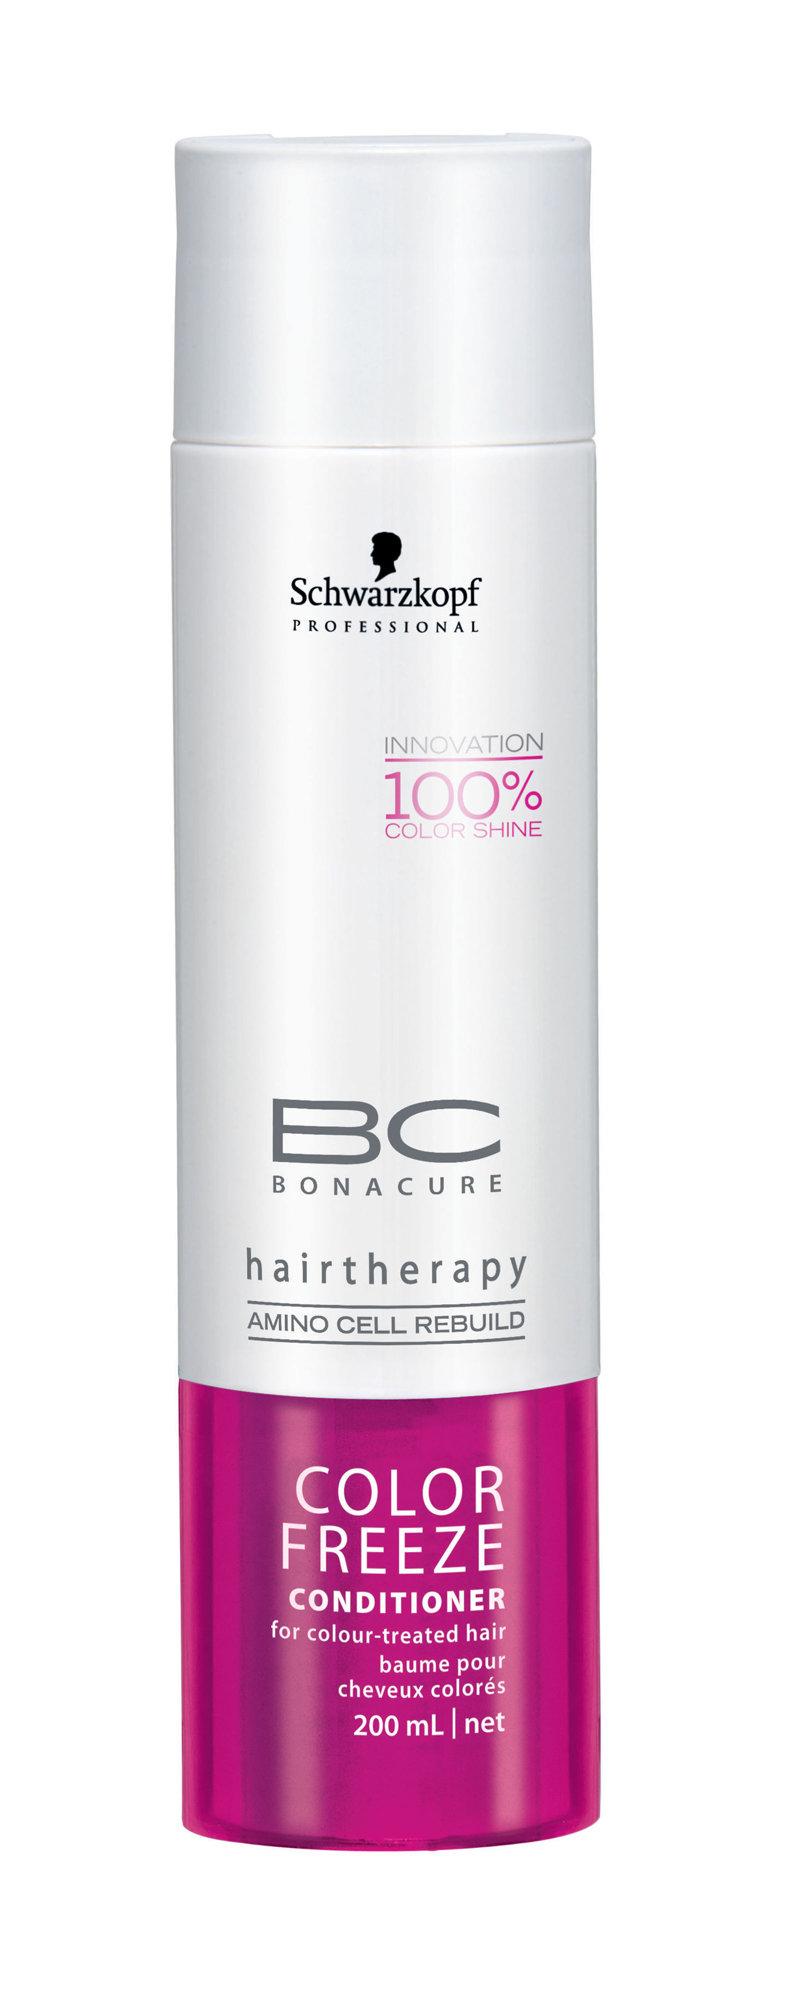 Schwarzkopf Professional BC Bonacure Cosmetic 200ml